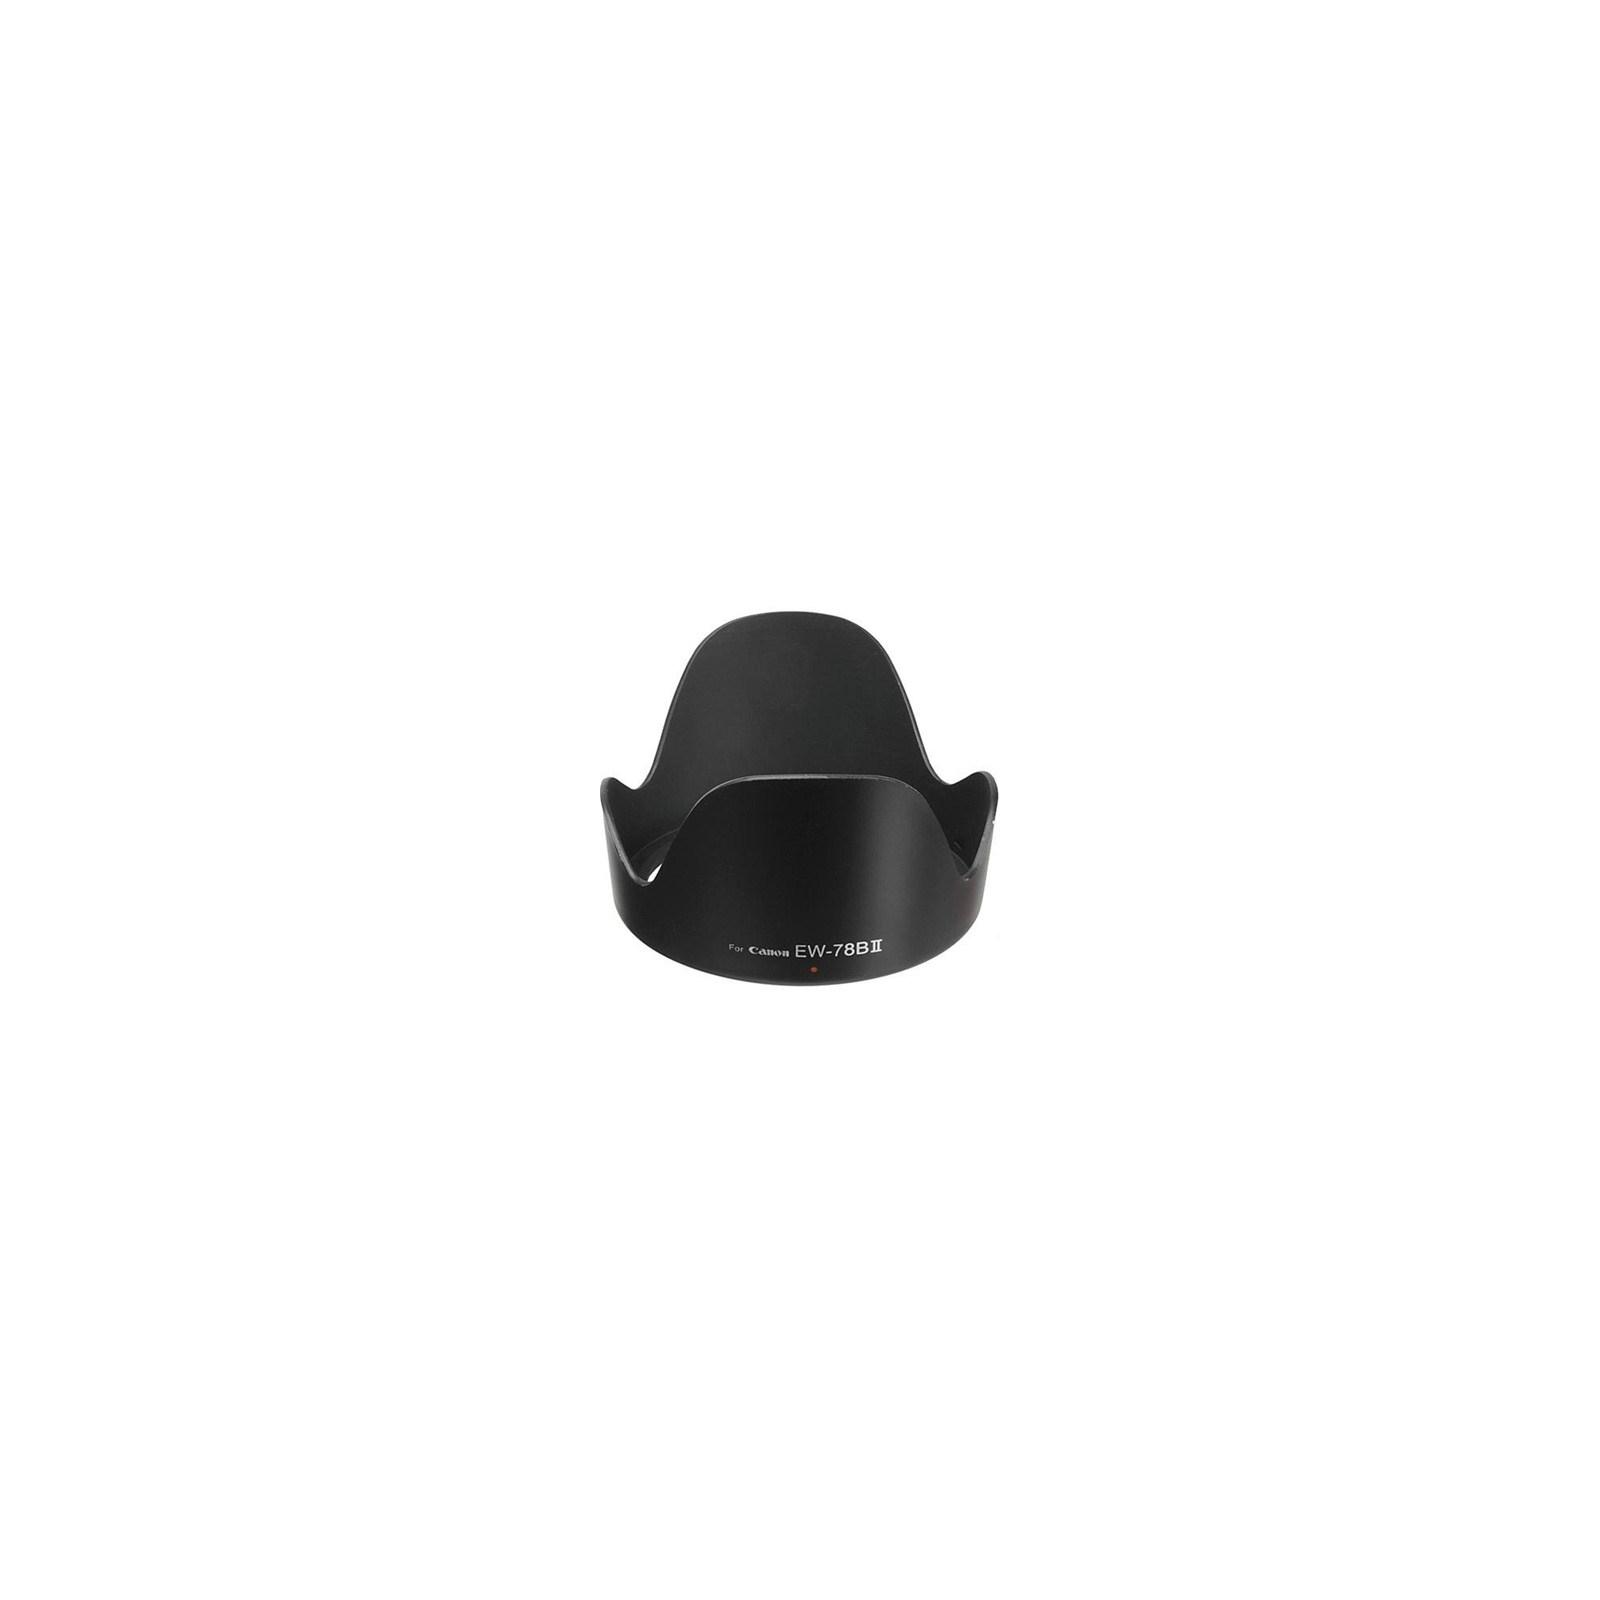 Бленда к объективу EW-78BII Canon (2676A001)